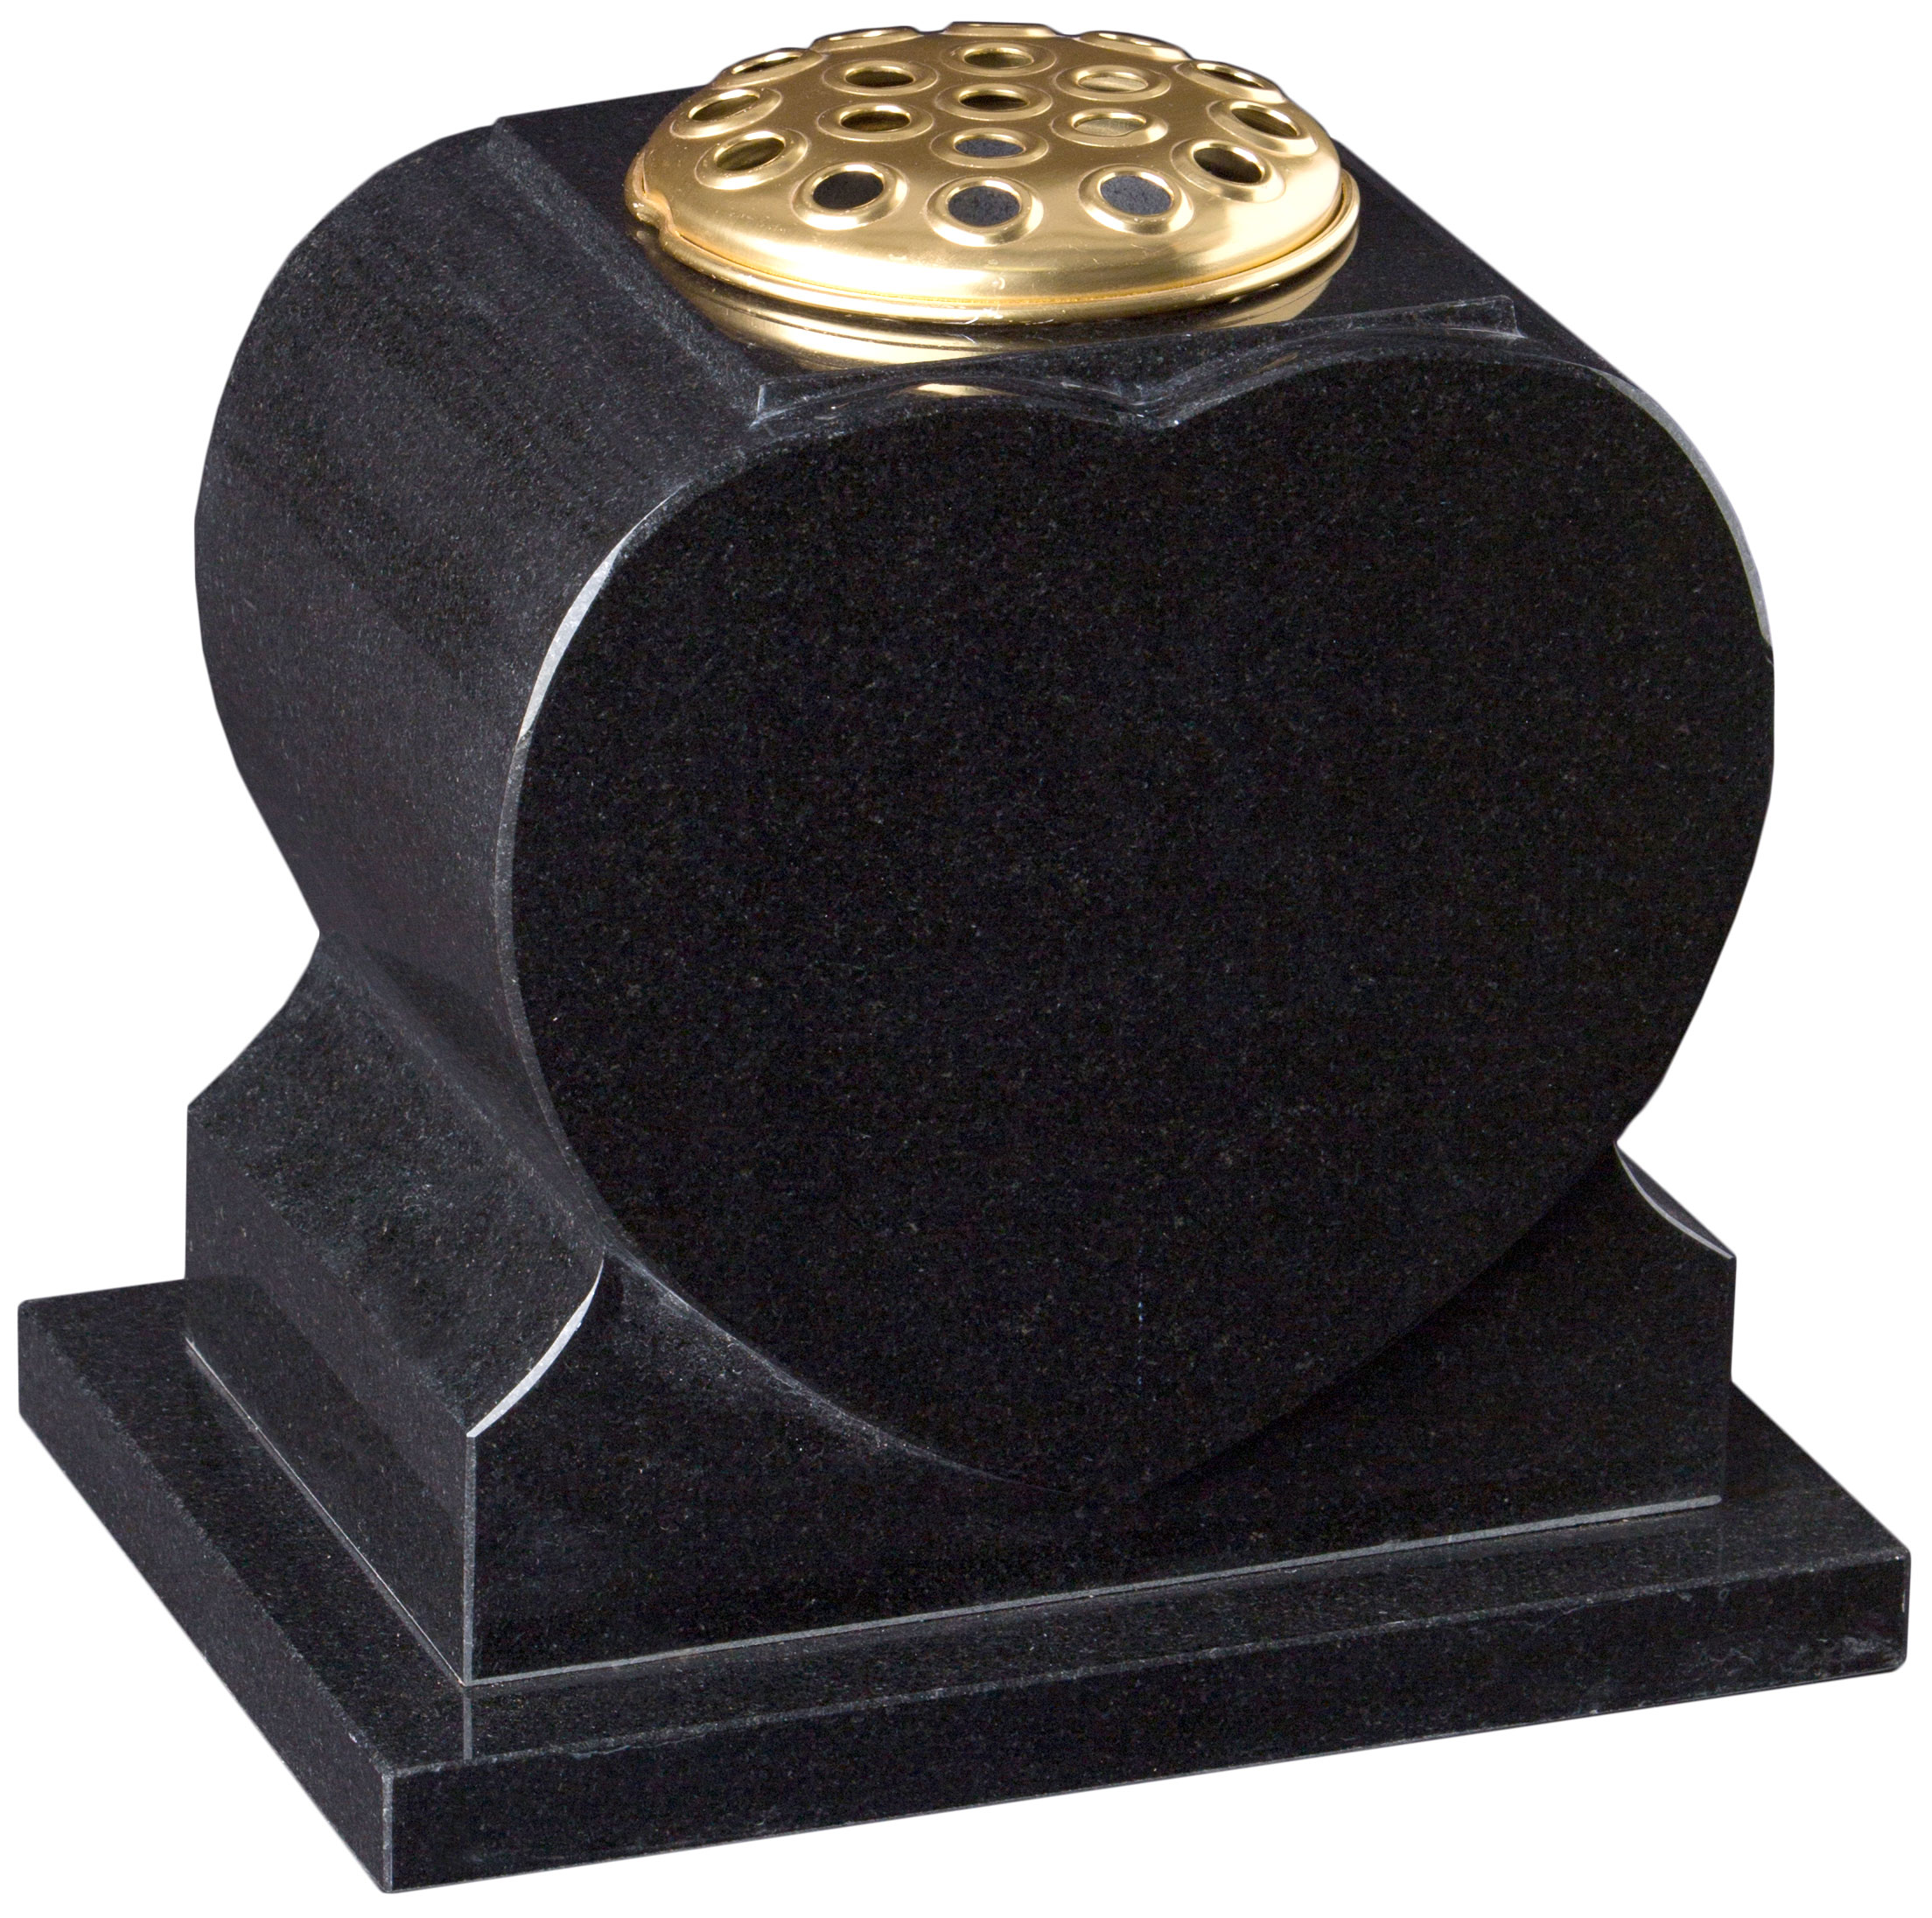 16207 Heart shaped vase